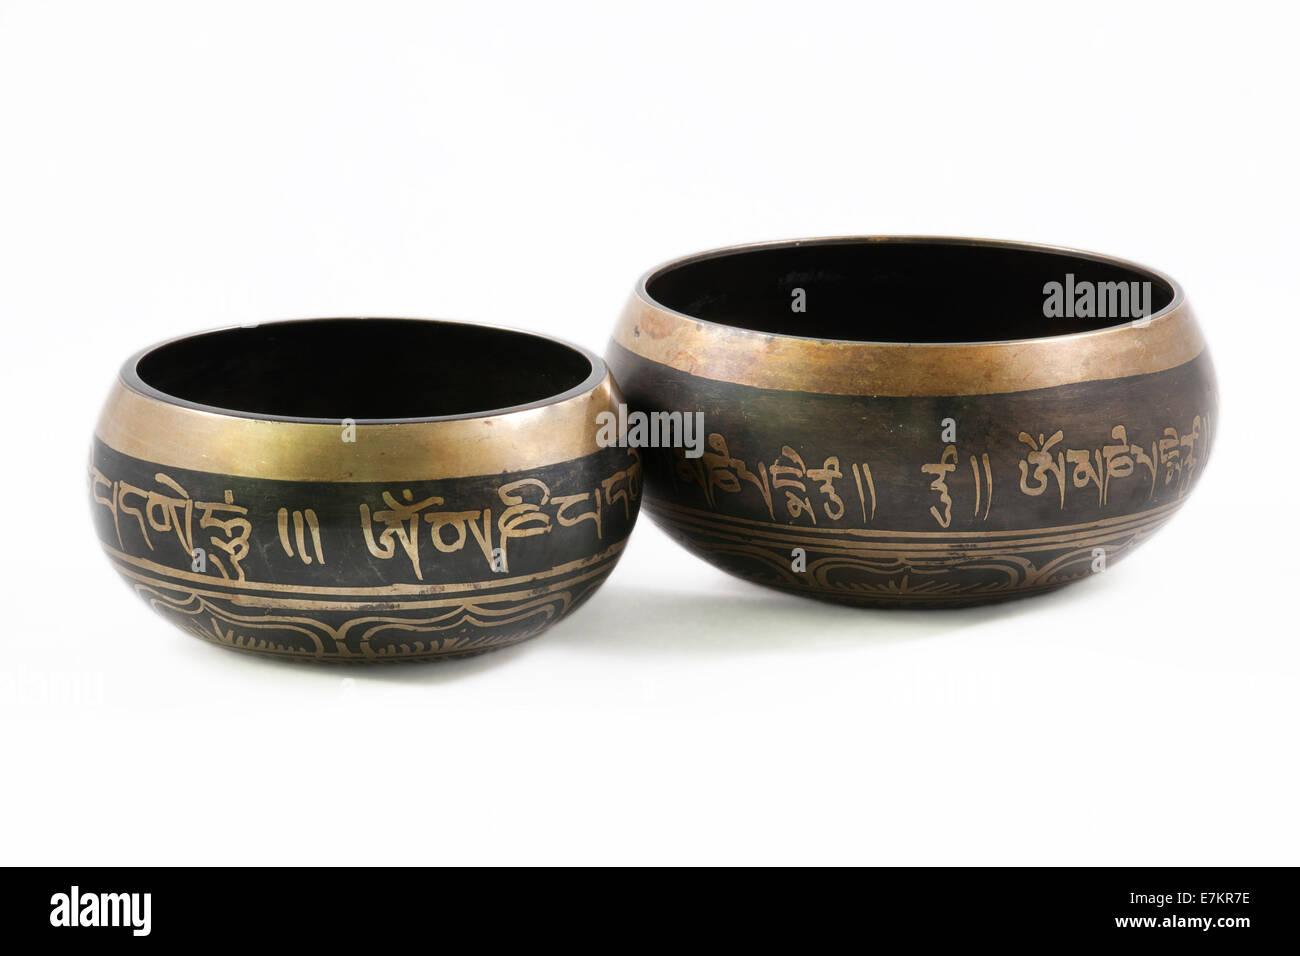 Tibetan Bowls isolated on white background - Stock Image